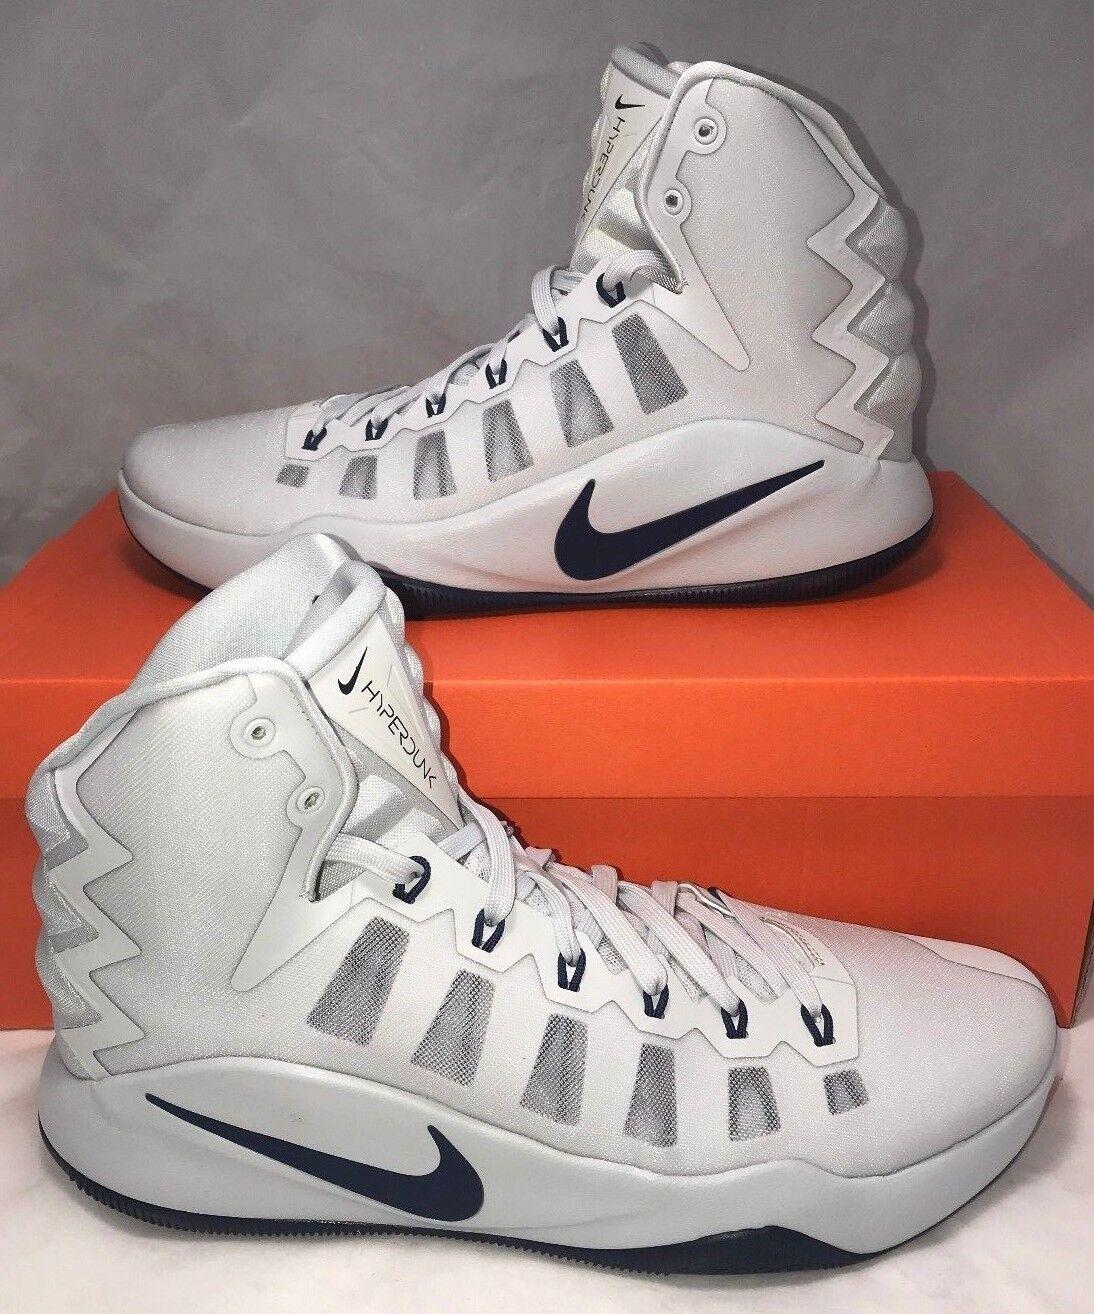 140 Nike Hyperdunk Mens Size 10 Platinum Navy 2016 Basketball Shoes New